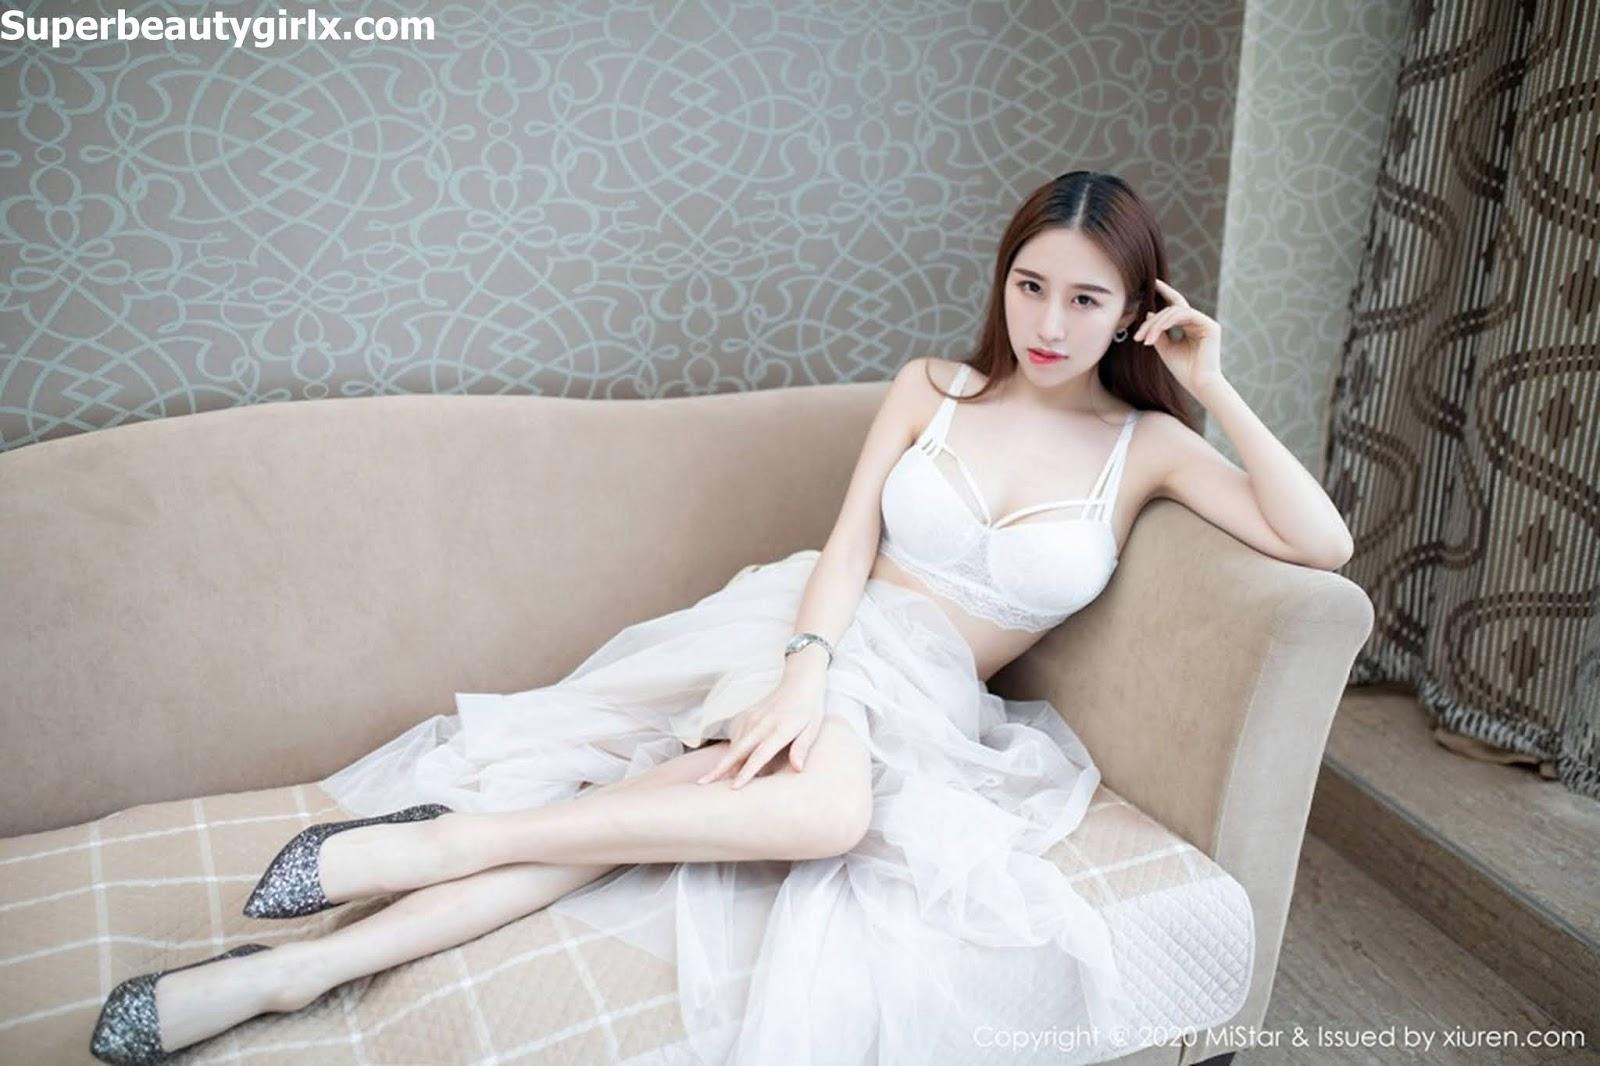 MiStar-Vol.323-Yue-Yin-Tong-Superbeautygirlx.com